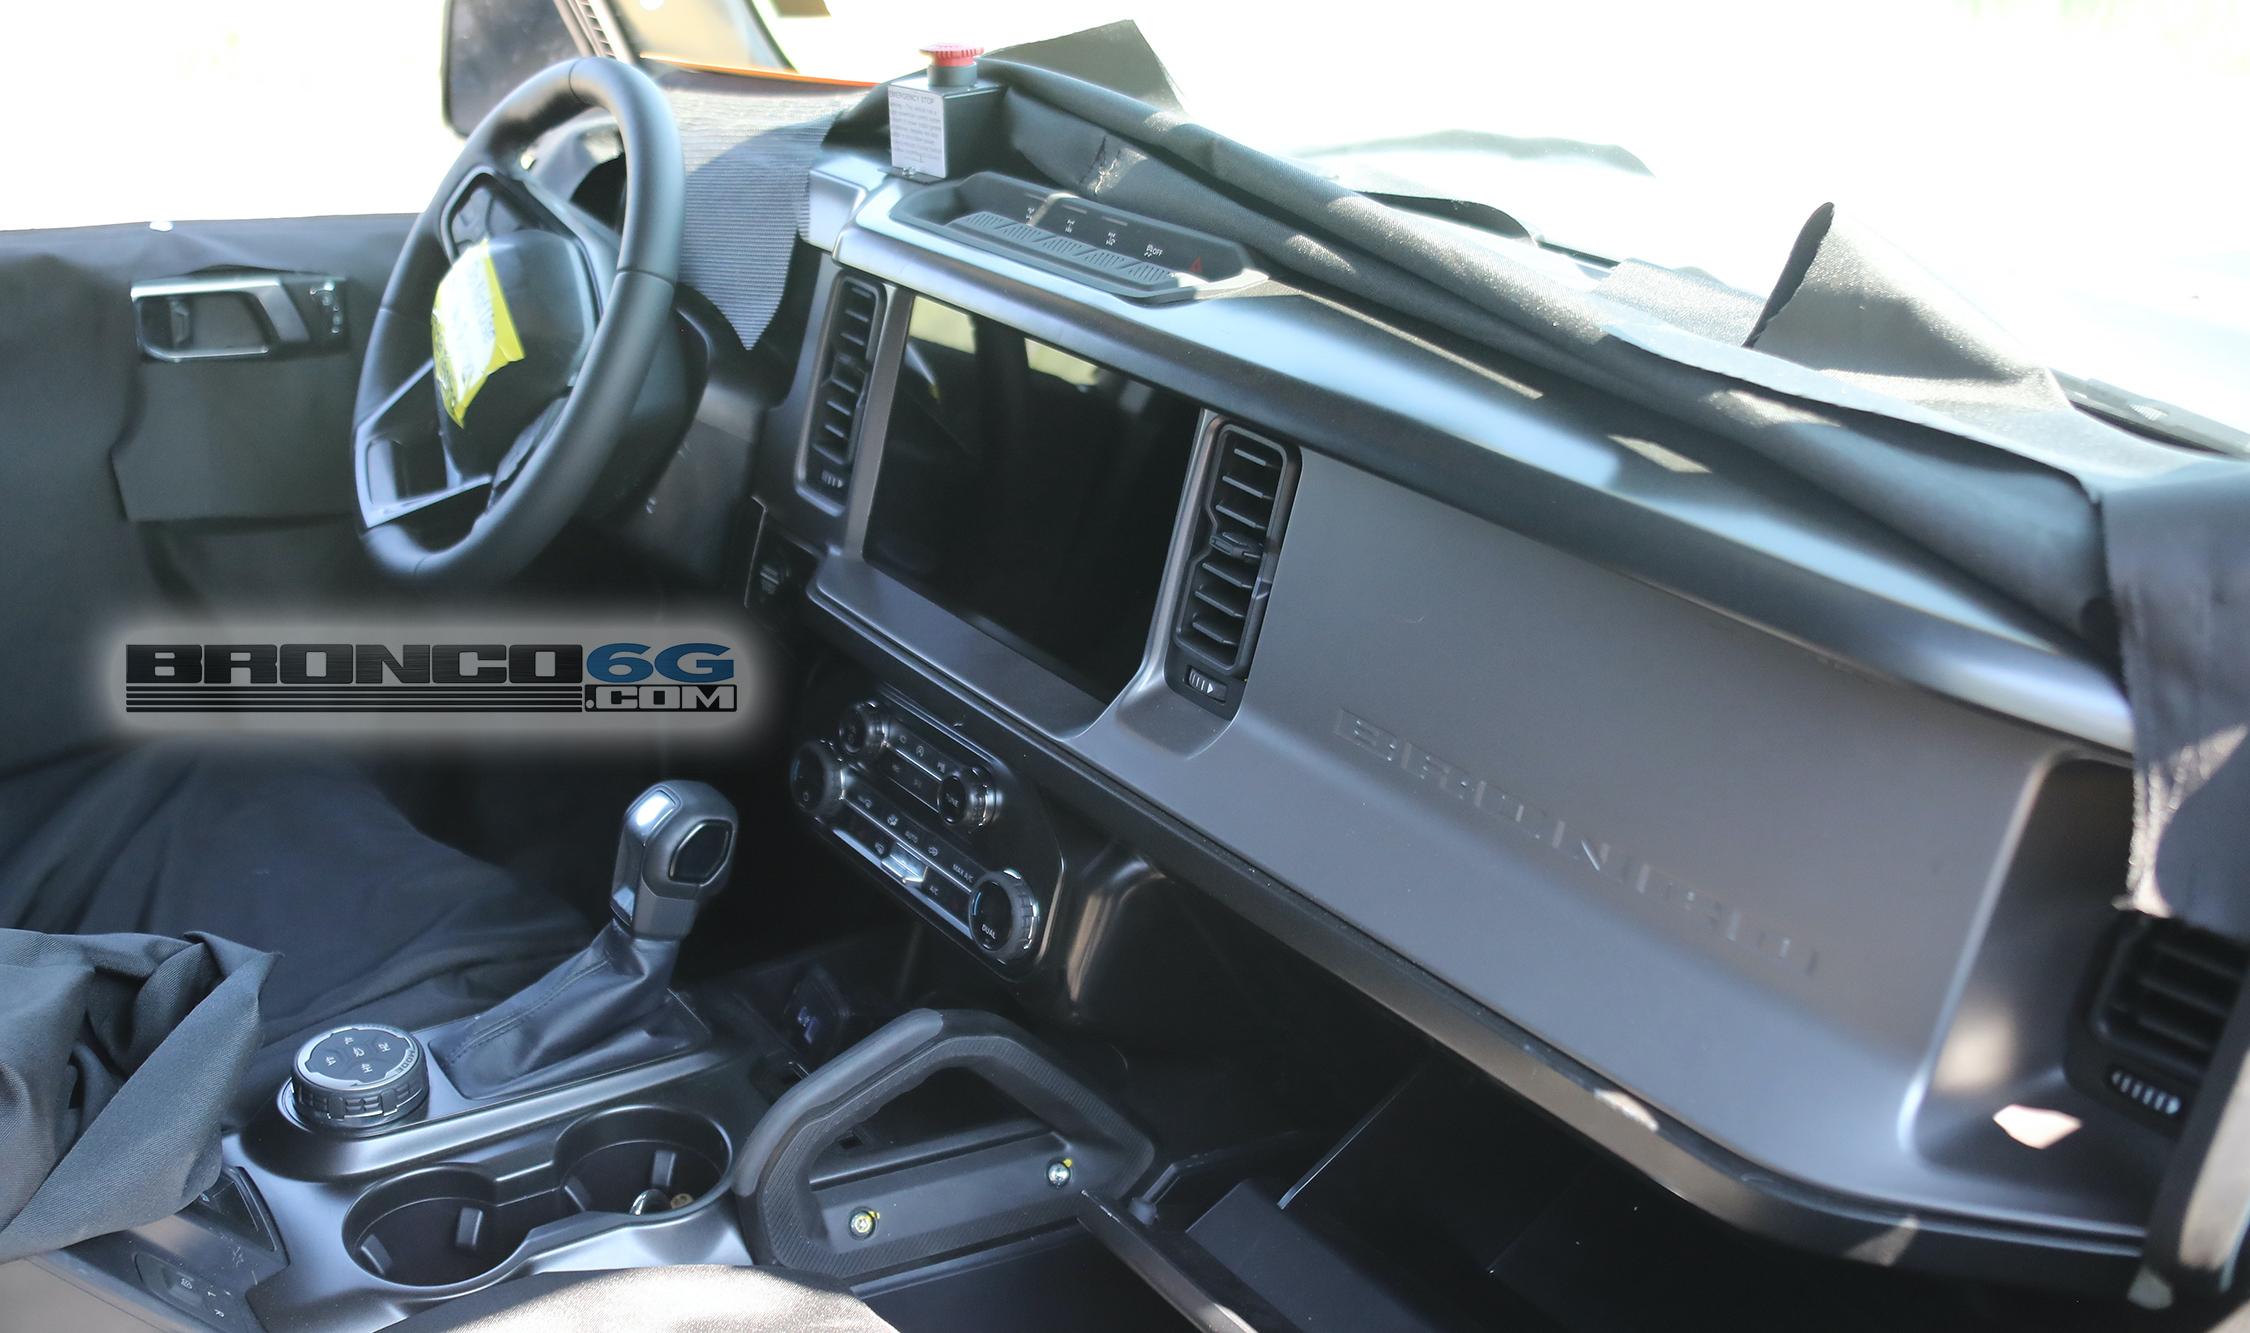 Spied: 2021 Bronco Interior Full Look @ Dash, Screen ...